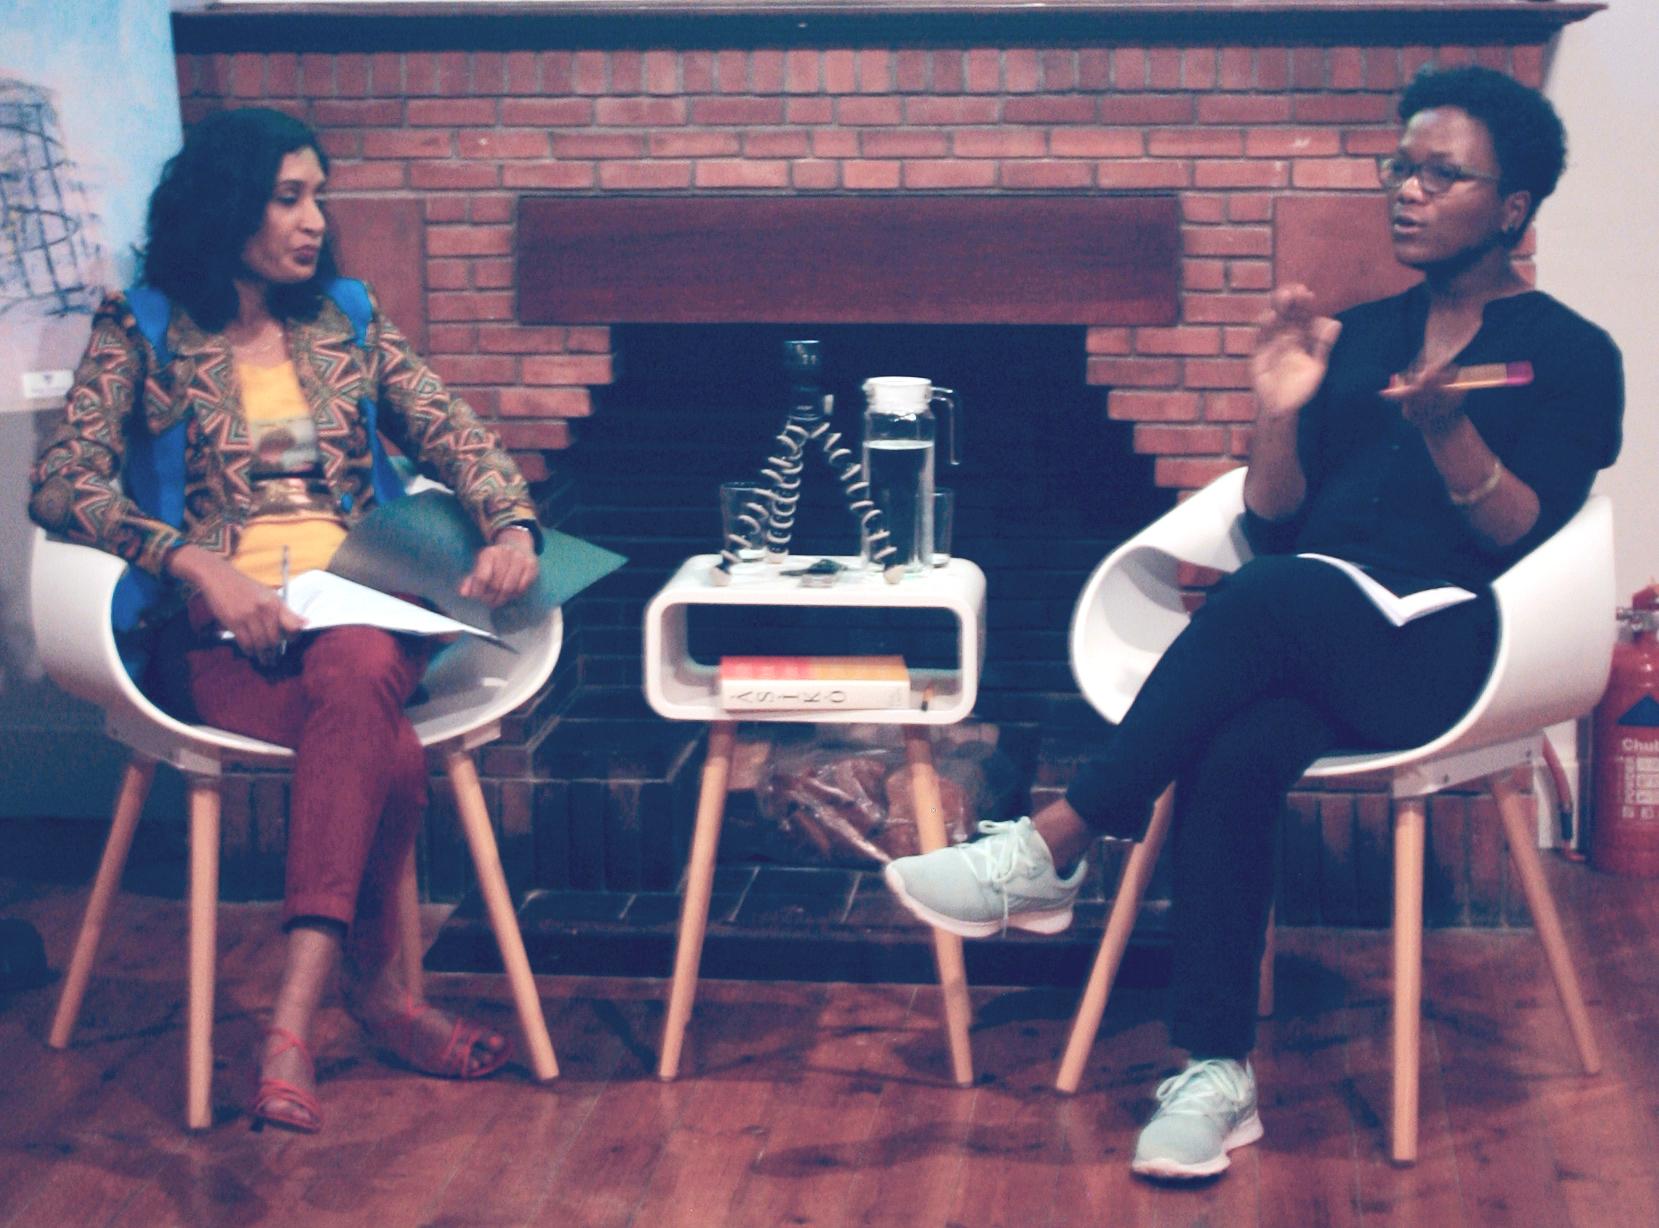 Sharlene Khan in Creative Dialogue with Nontobeko Ntombela.